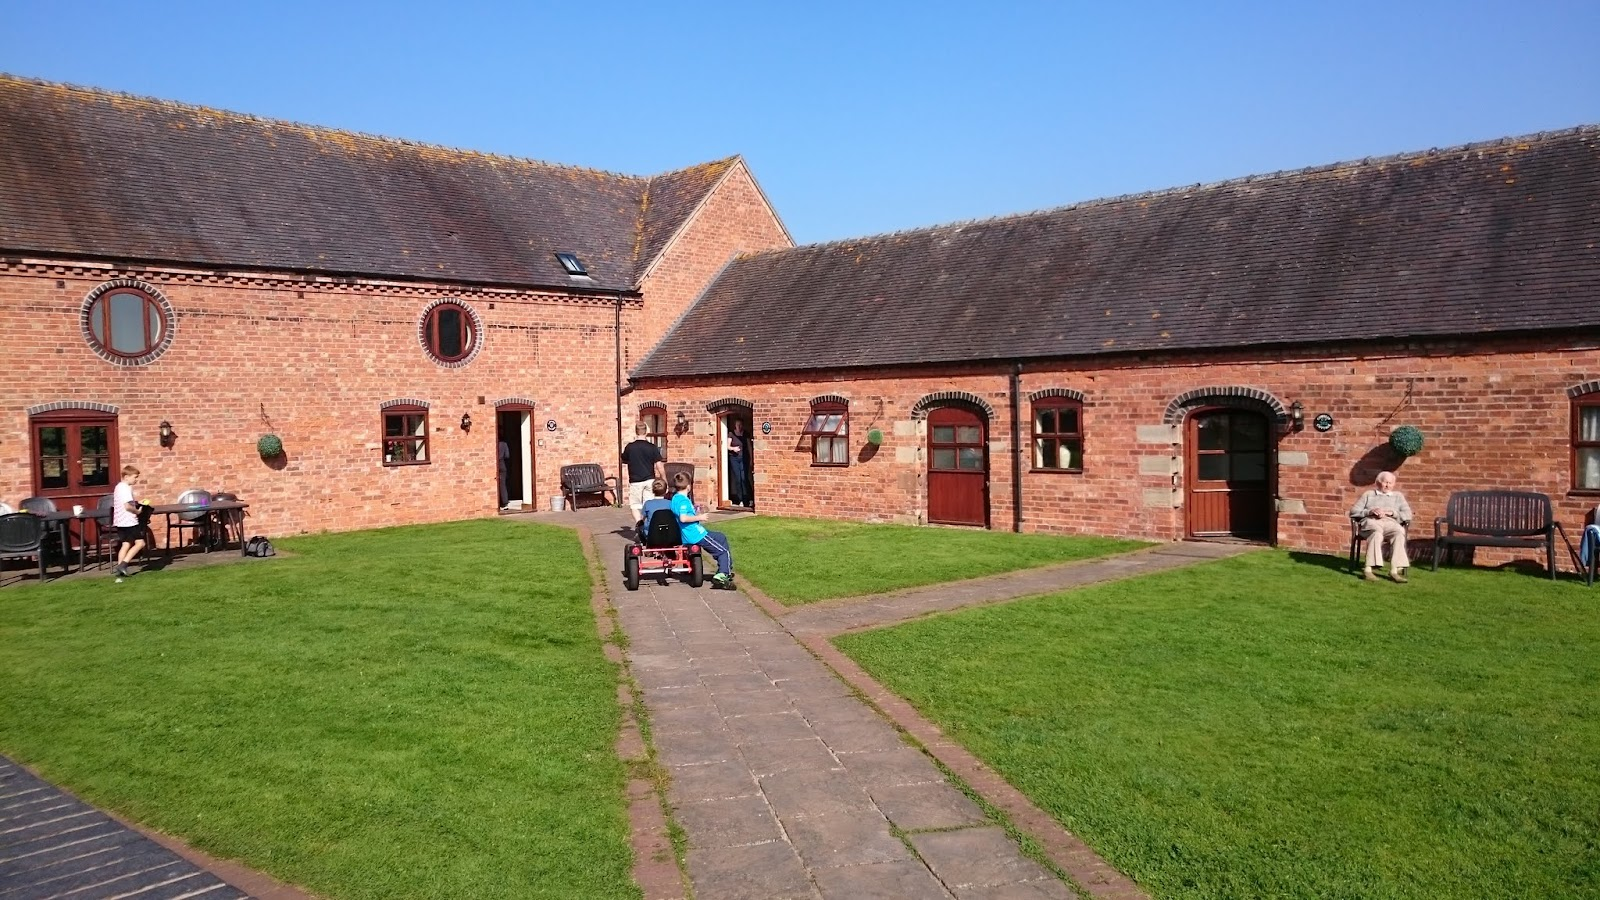 Layman's London: Oulton House Farm, Norbury, Stafford,Staffordshire